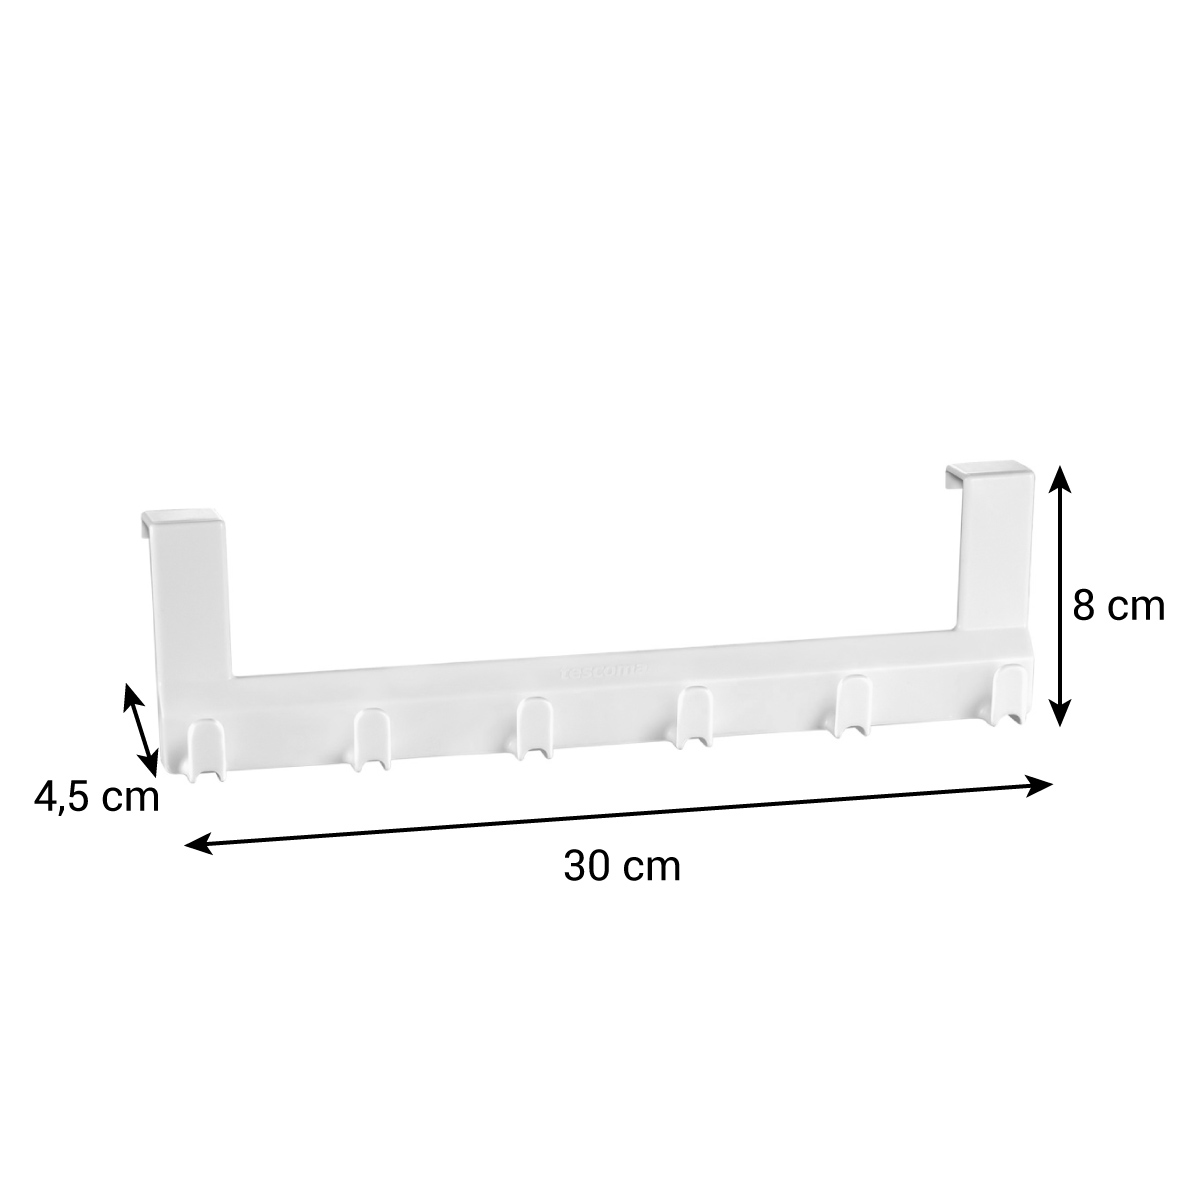 Závěsná lišta s háčky FlexiSPACE 30 cm